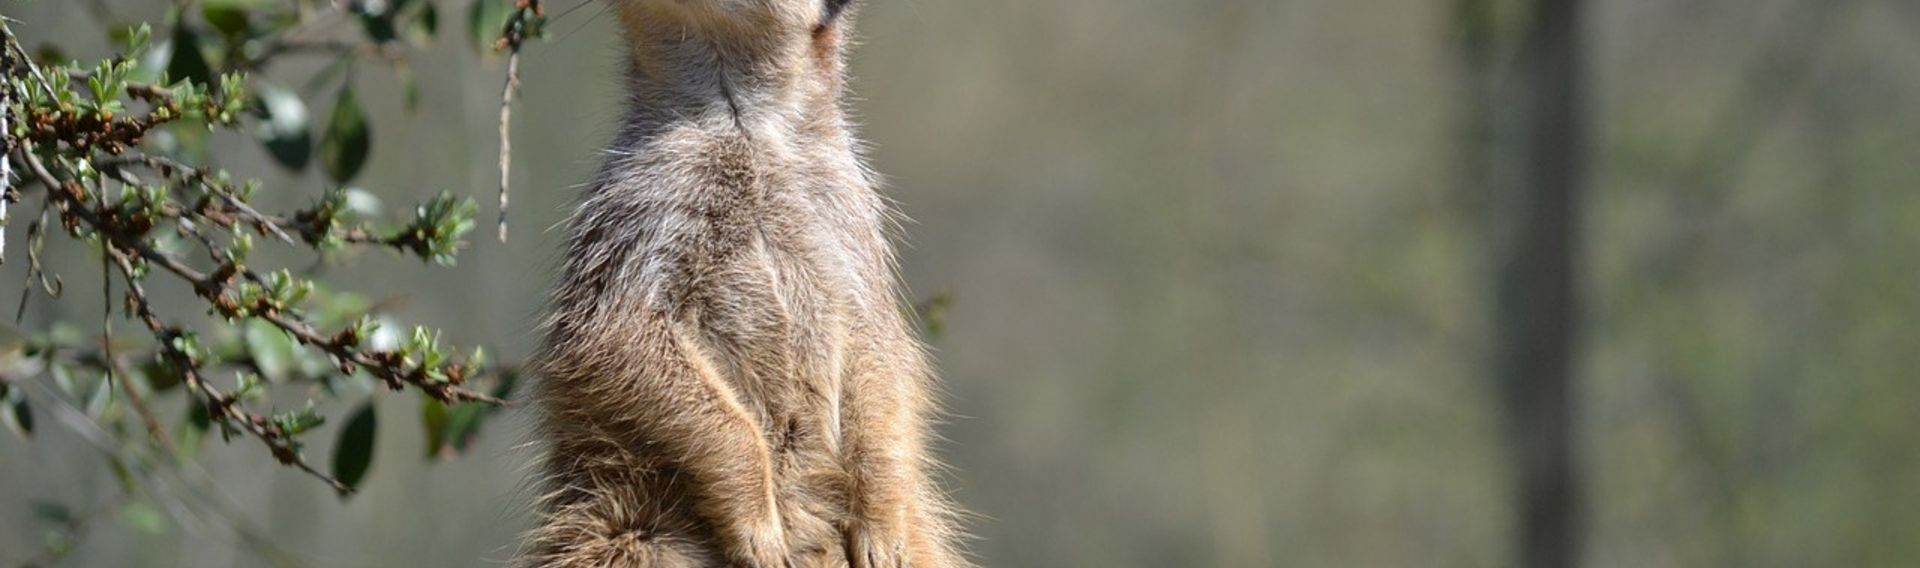 Ausflug NRW mit Kind – Tierpark Hamm